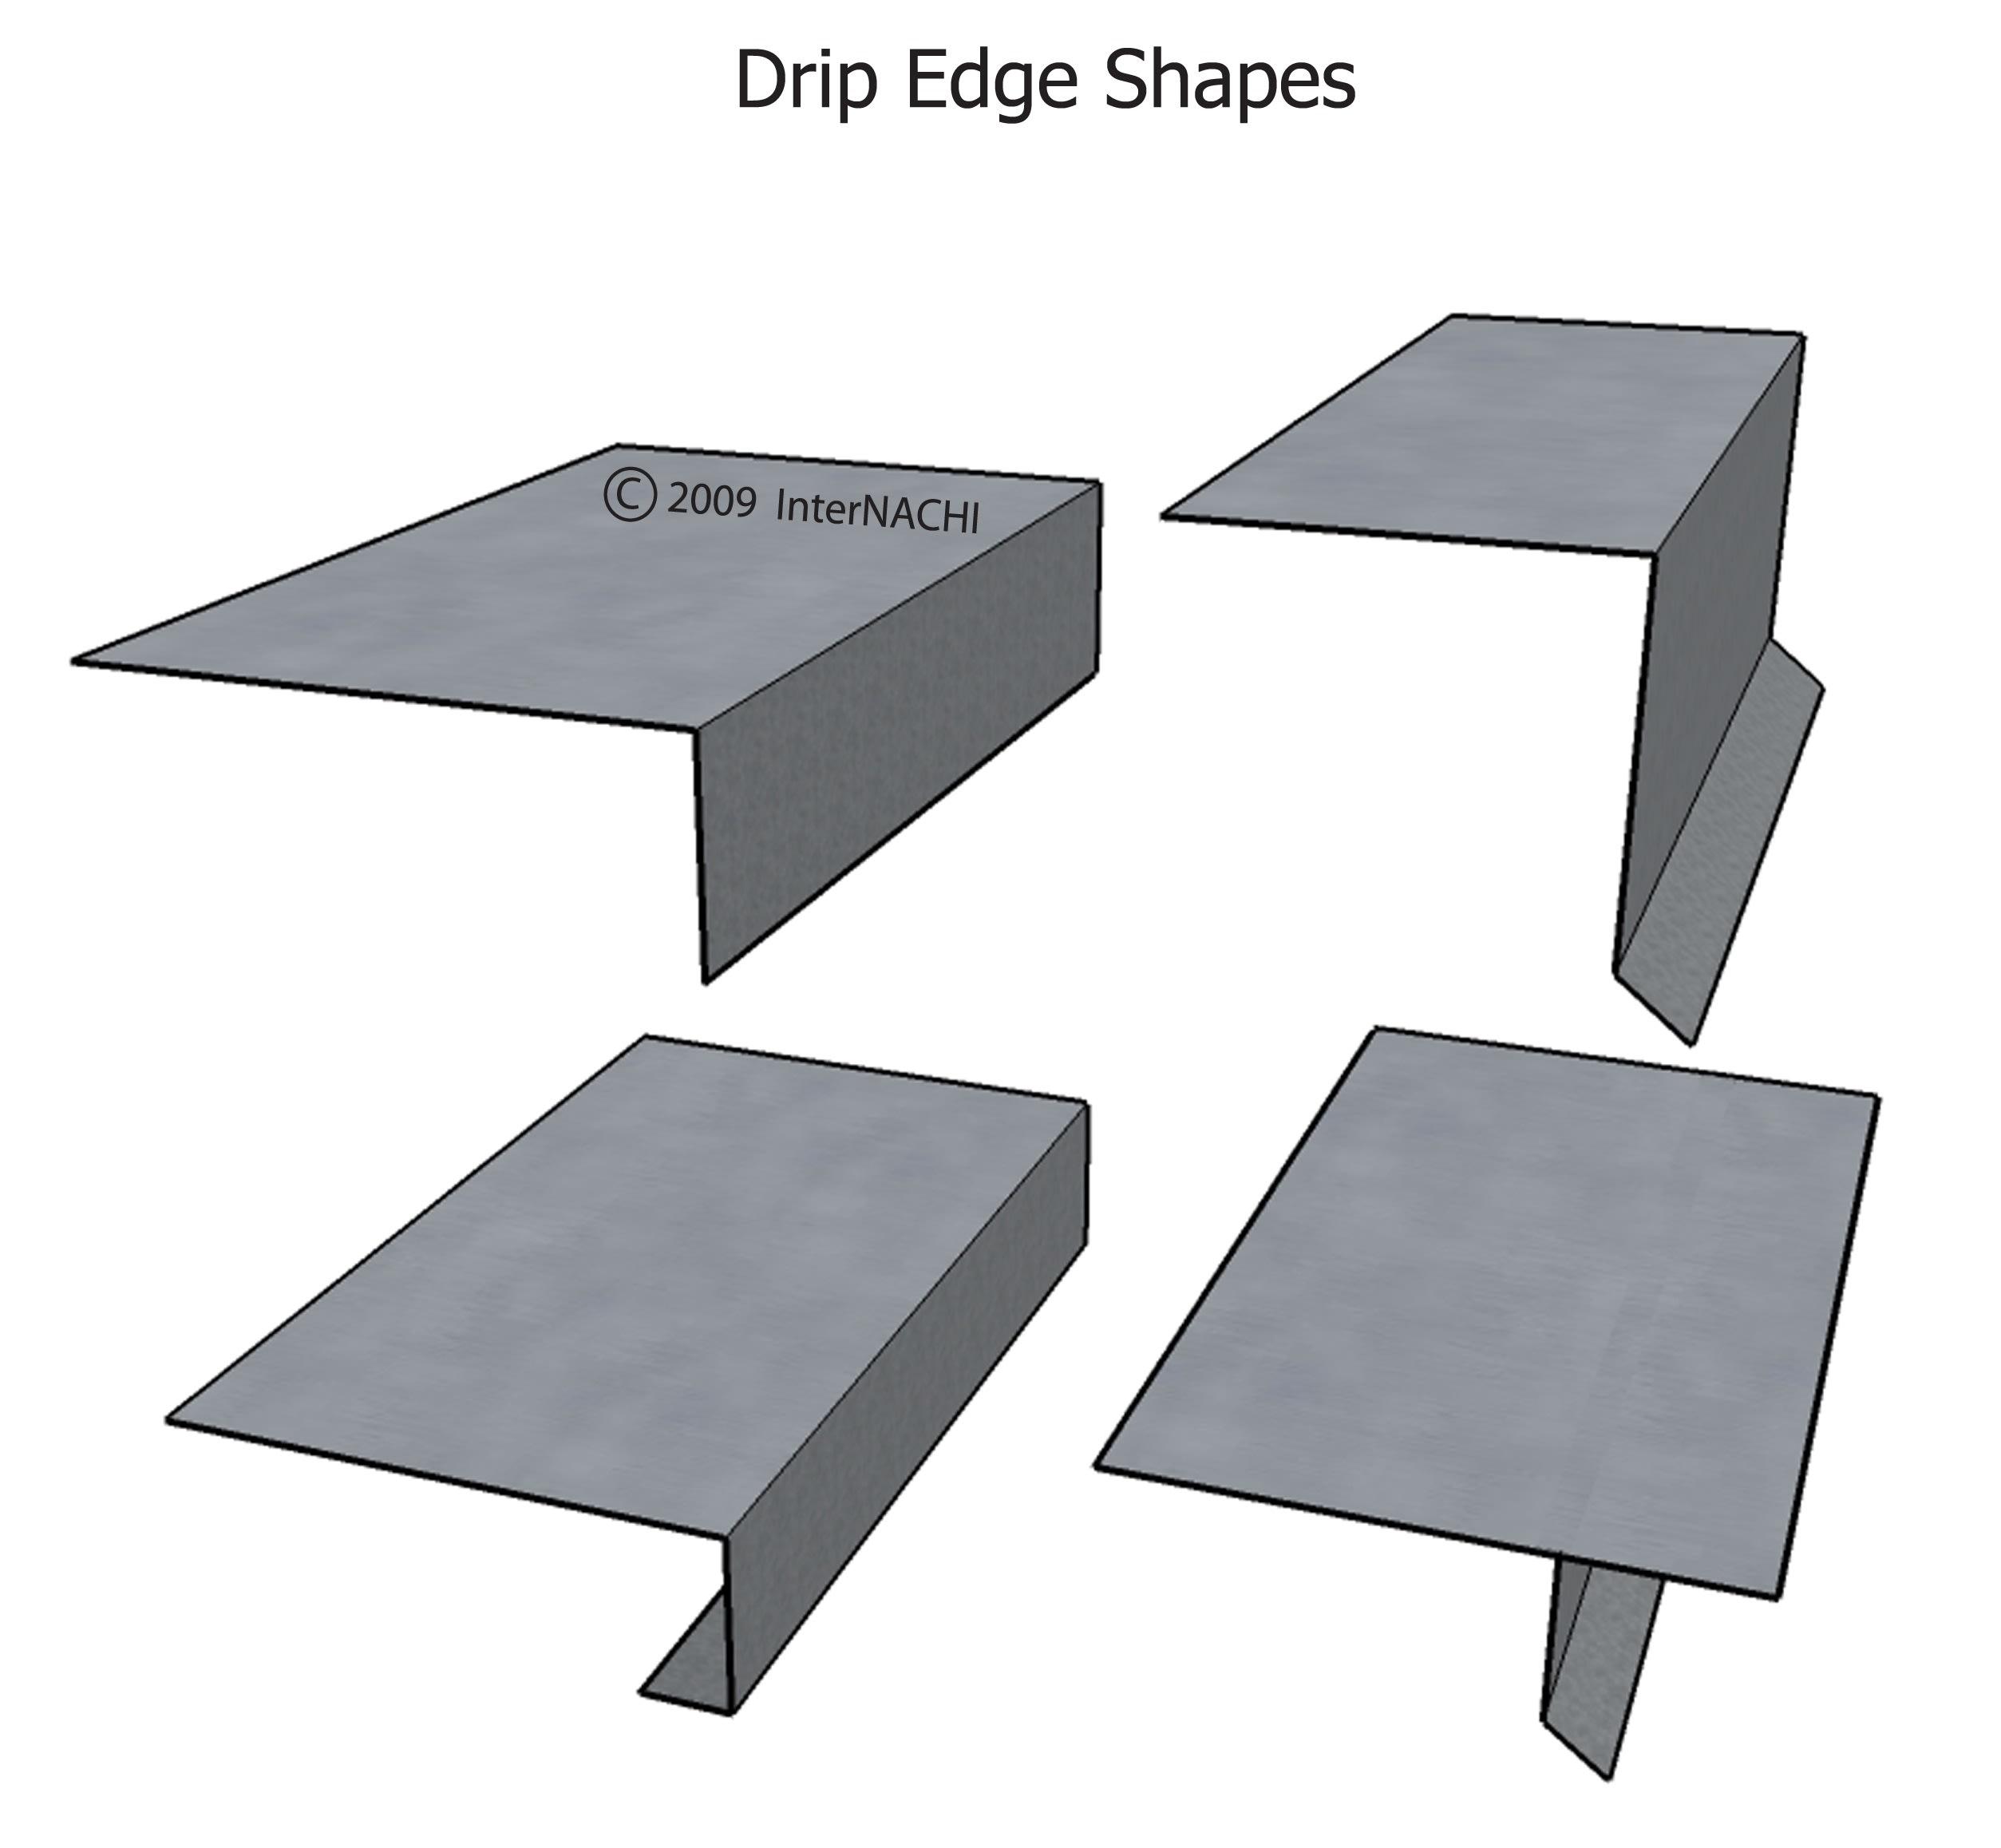 Drip edge shapes.